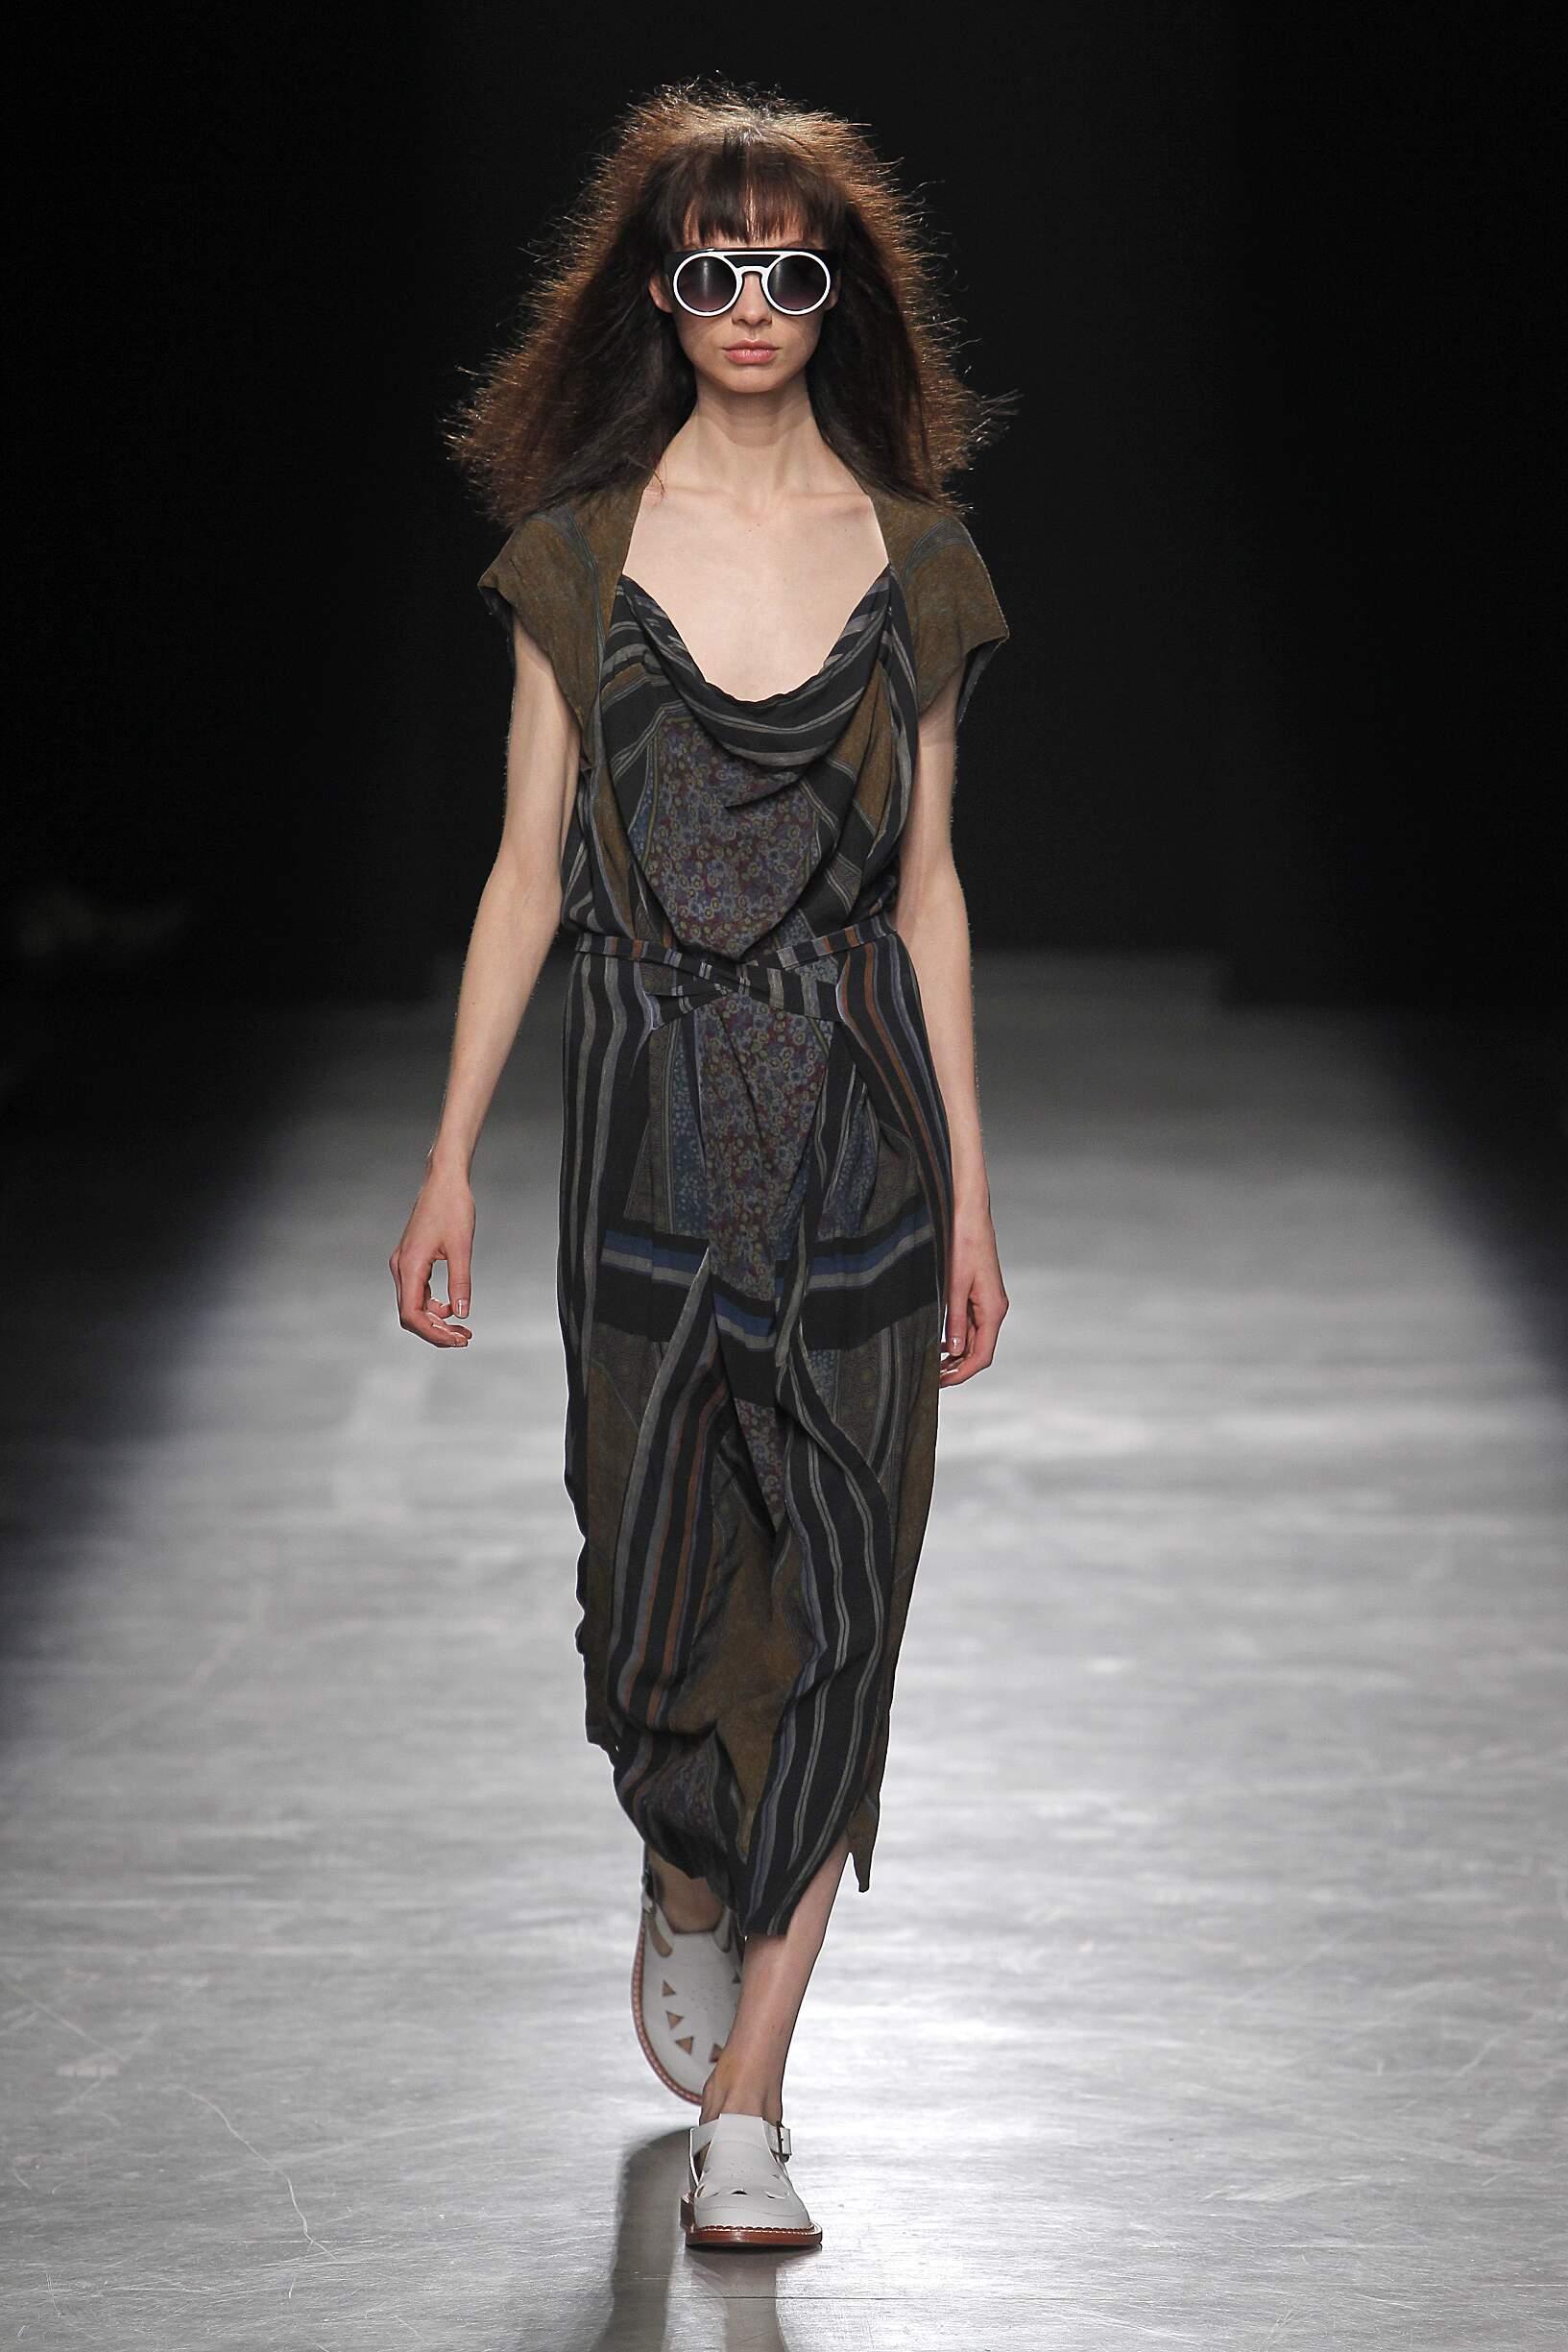 Andreas Kronthaler for Vivienne Westwood Paris Fashion Week